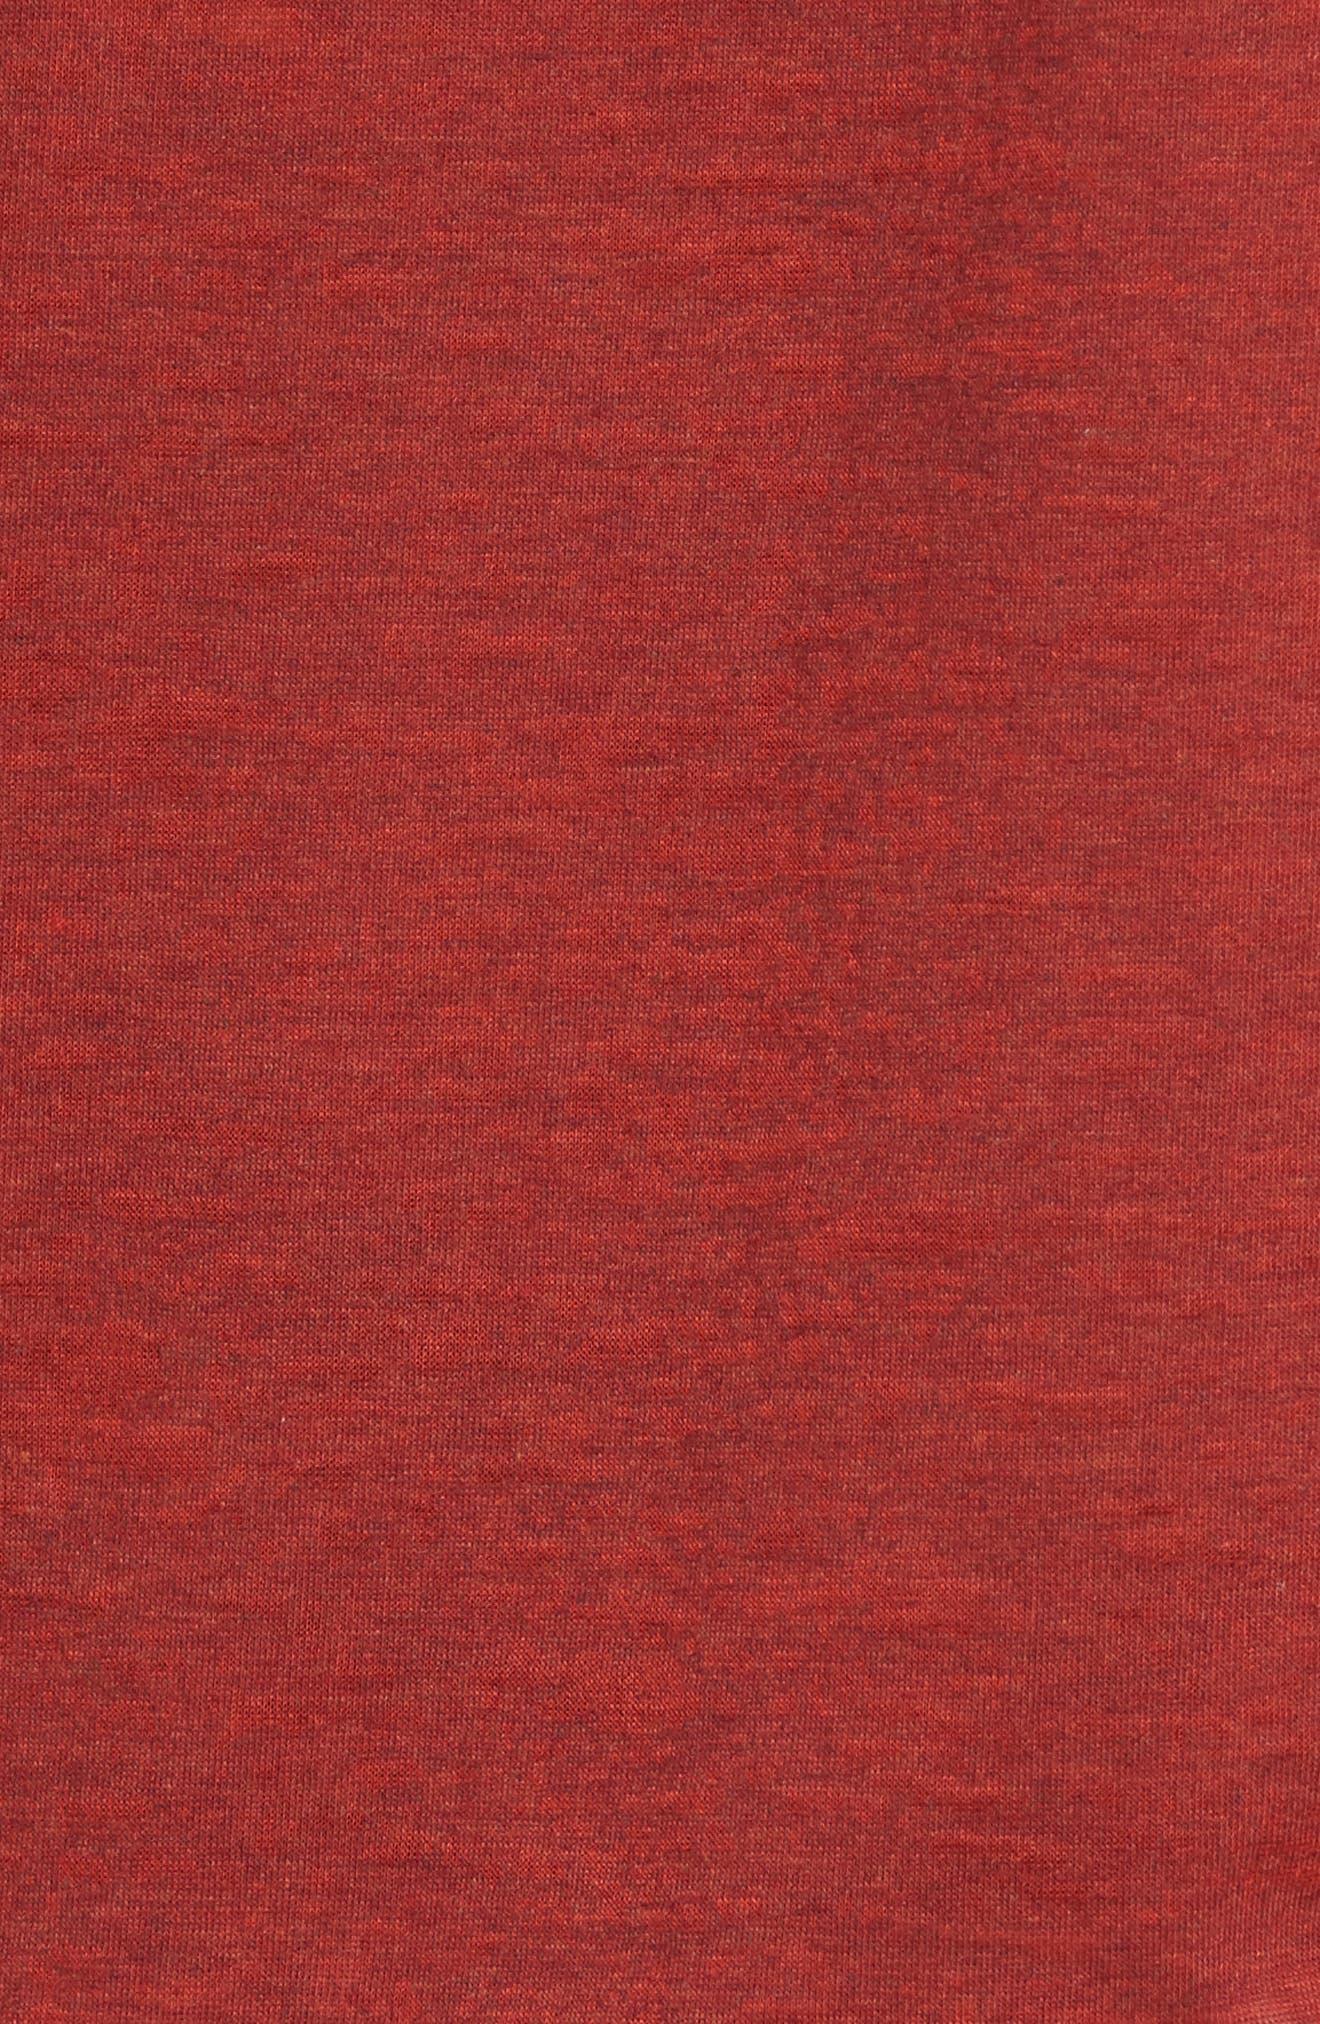 Raglan Sleeve T-Shirt,                             Alternate thumbnail 5, color,                             Tomato